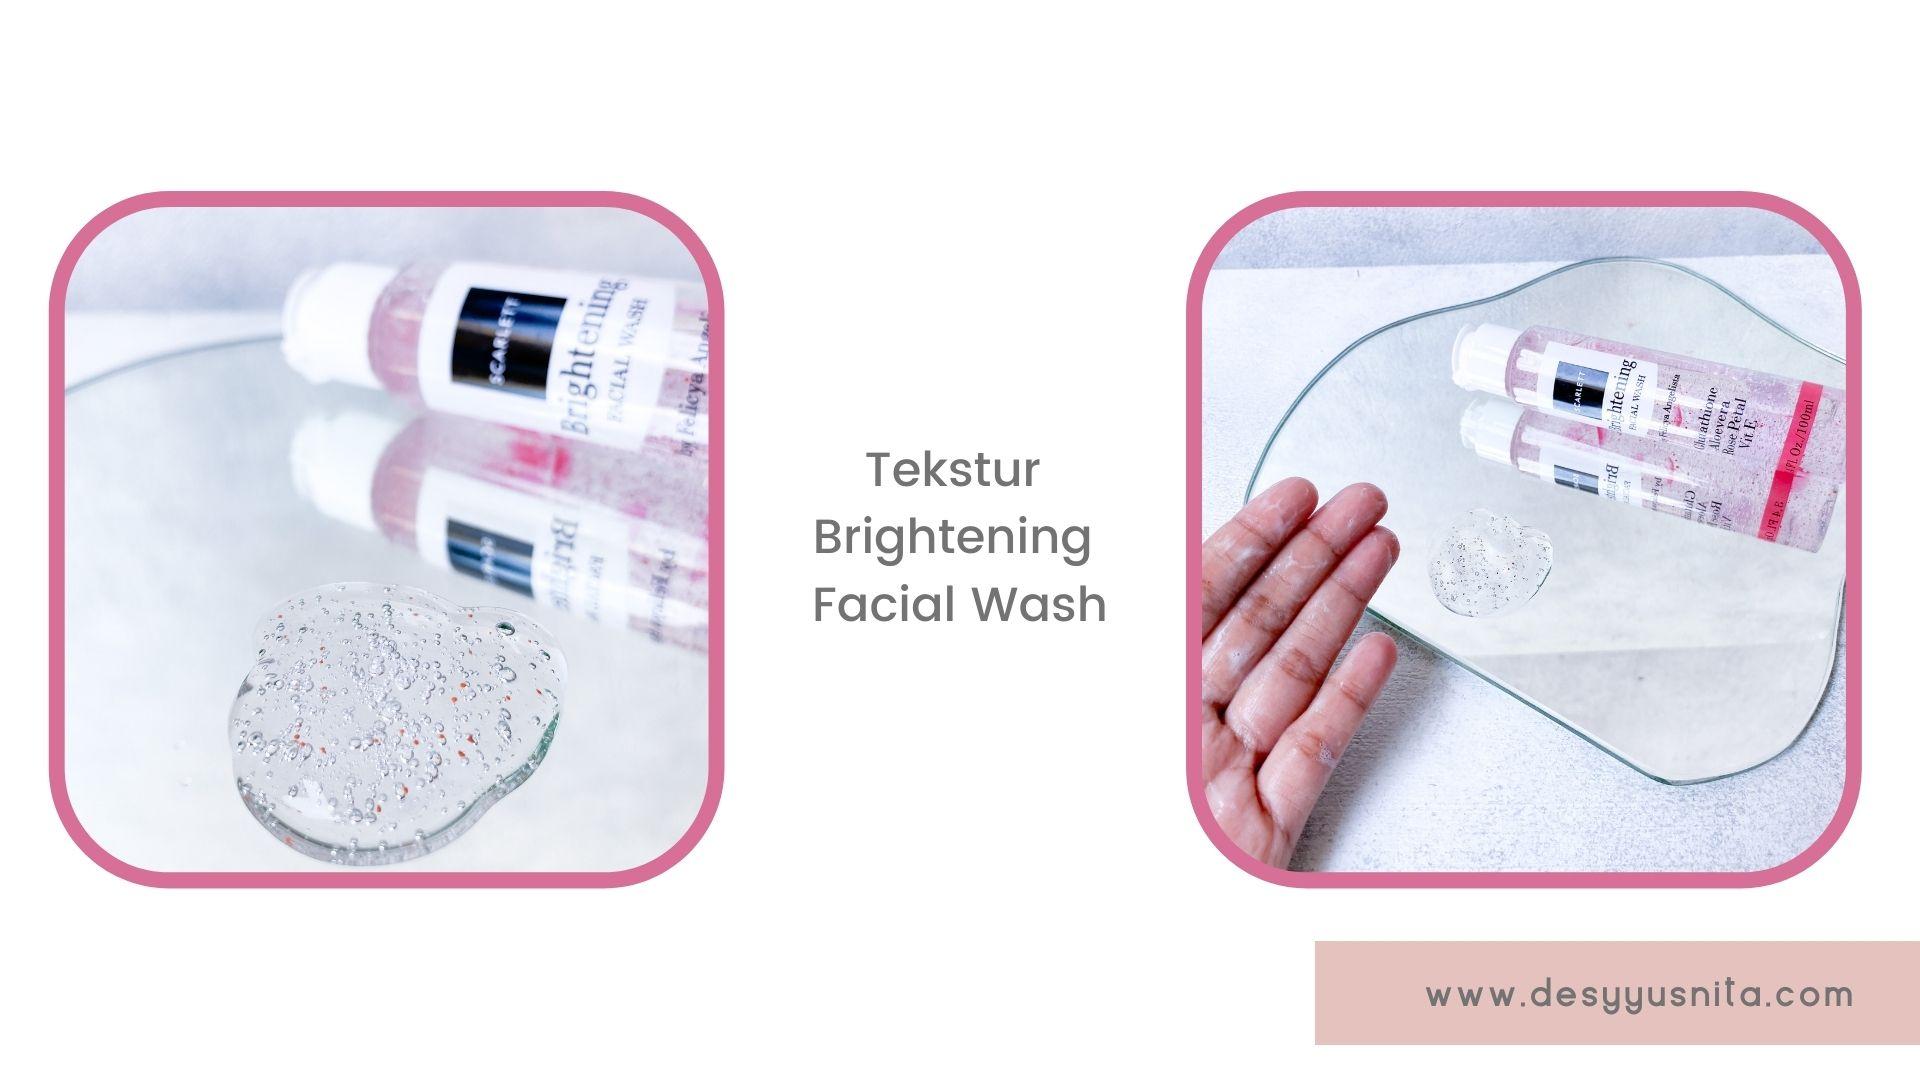 Tekstur Brightening Facial Wash